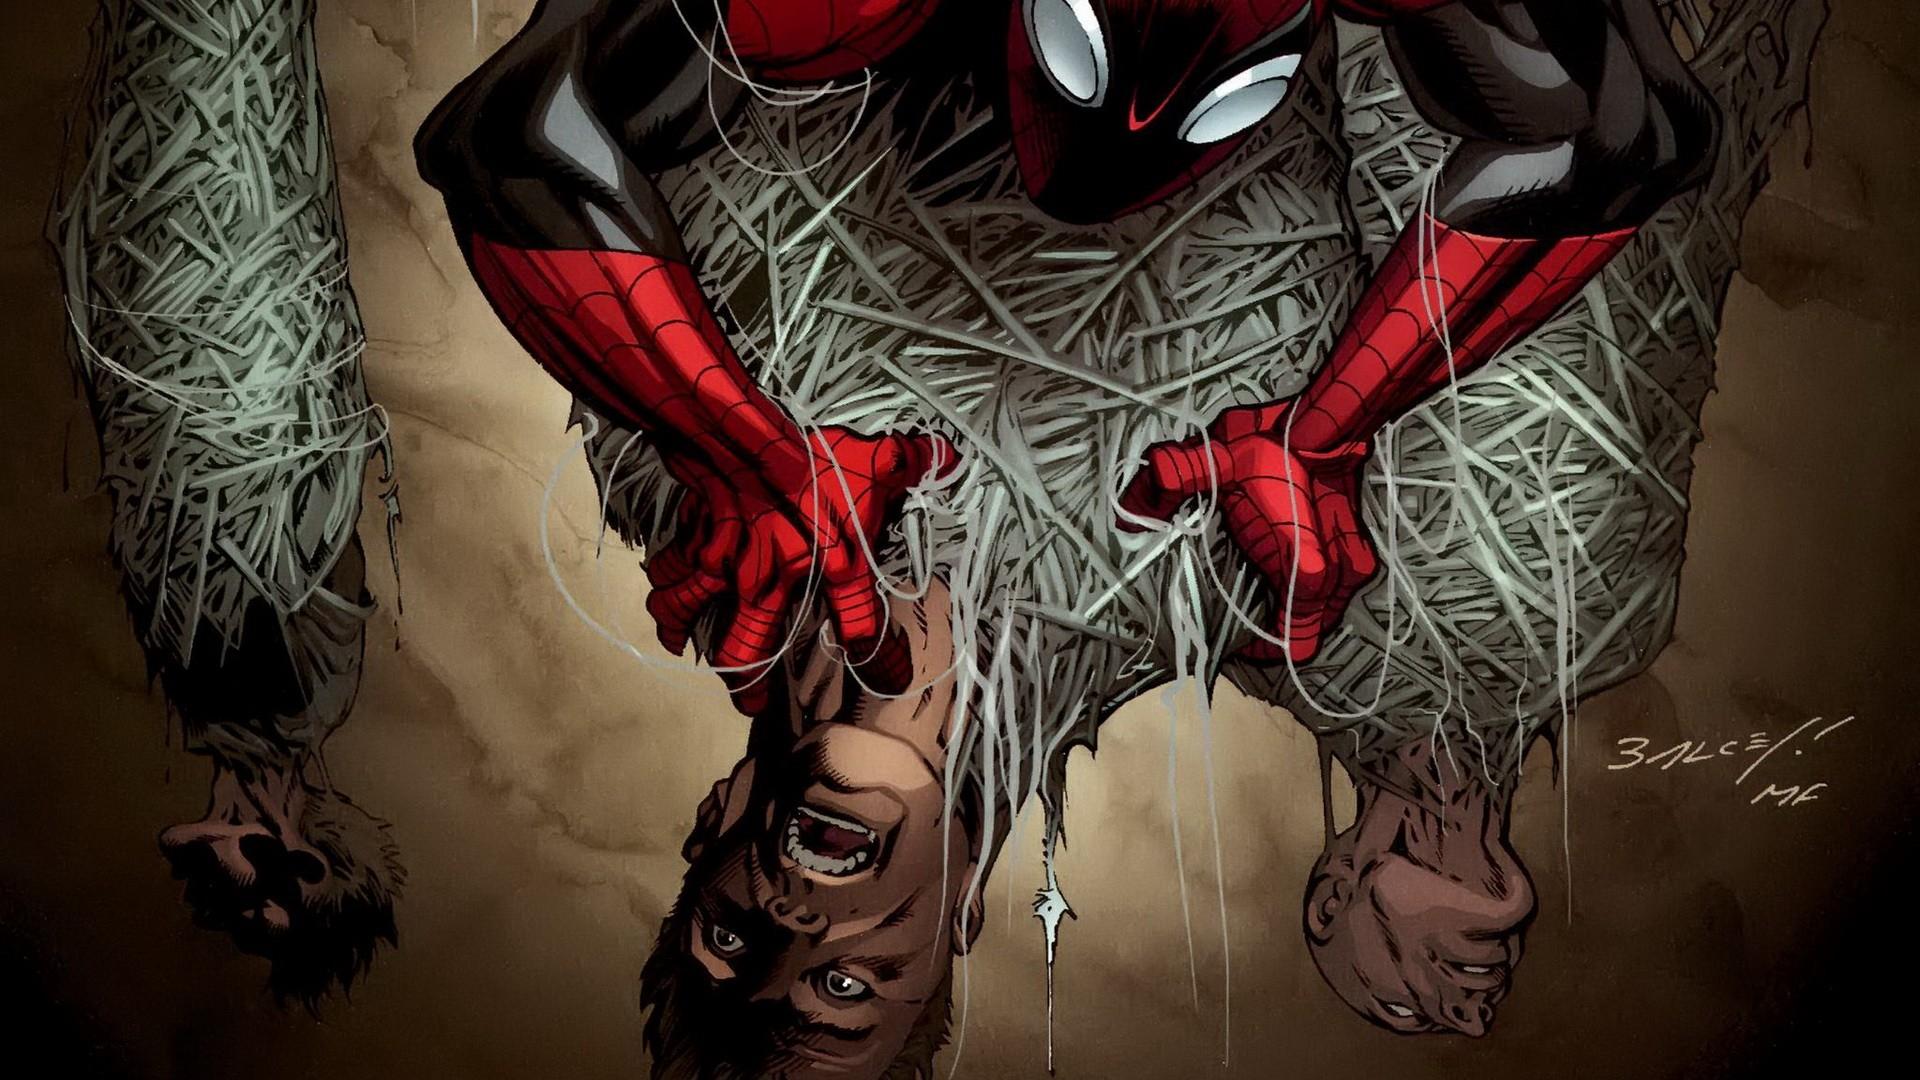 Superior spider man hd wallpaper background image - Man wallpaper ...